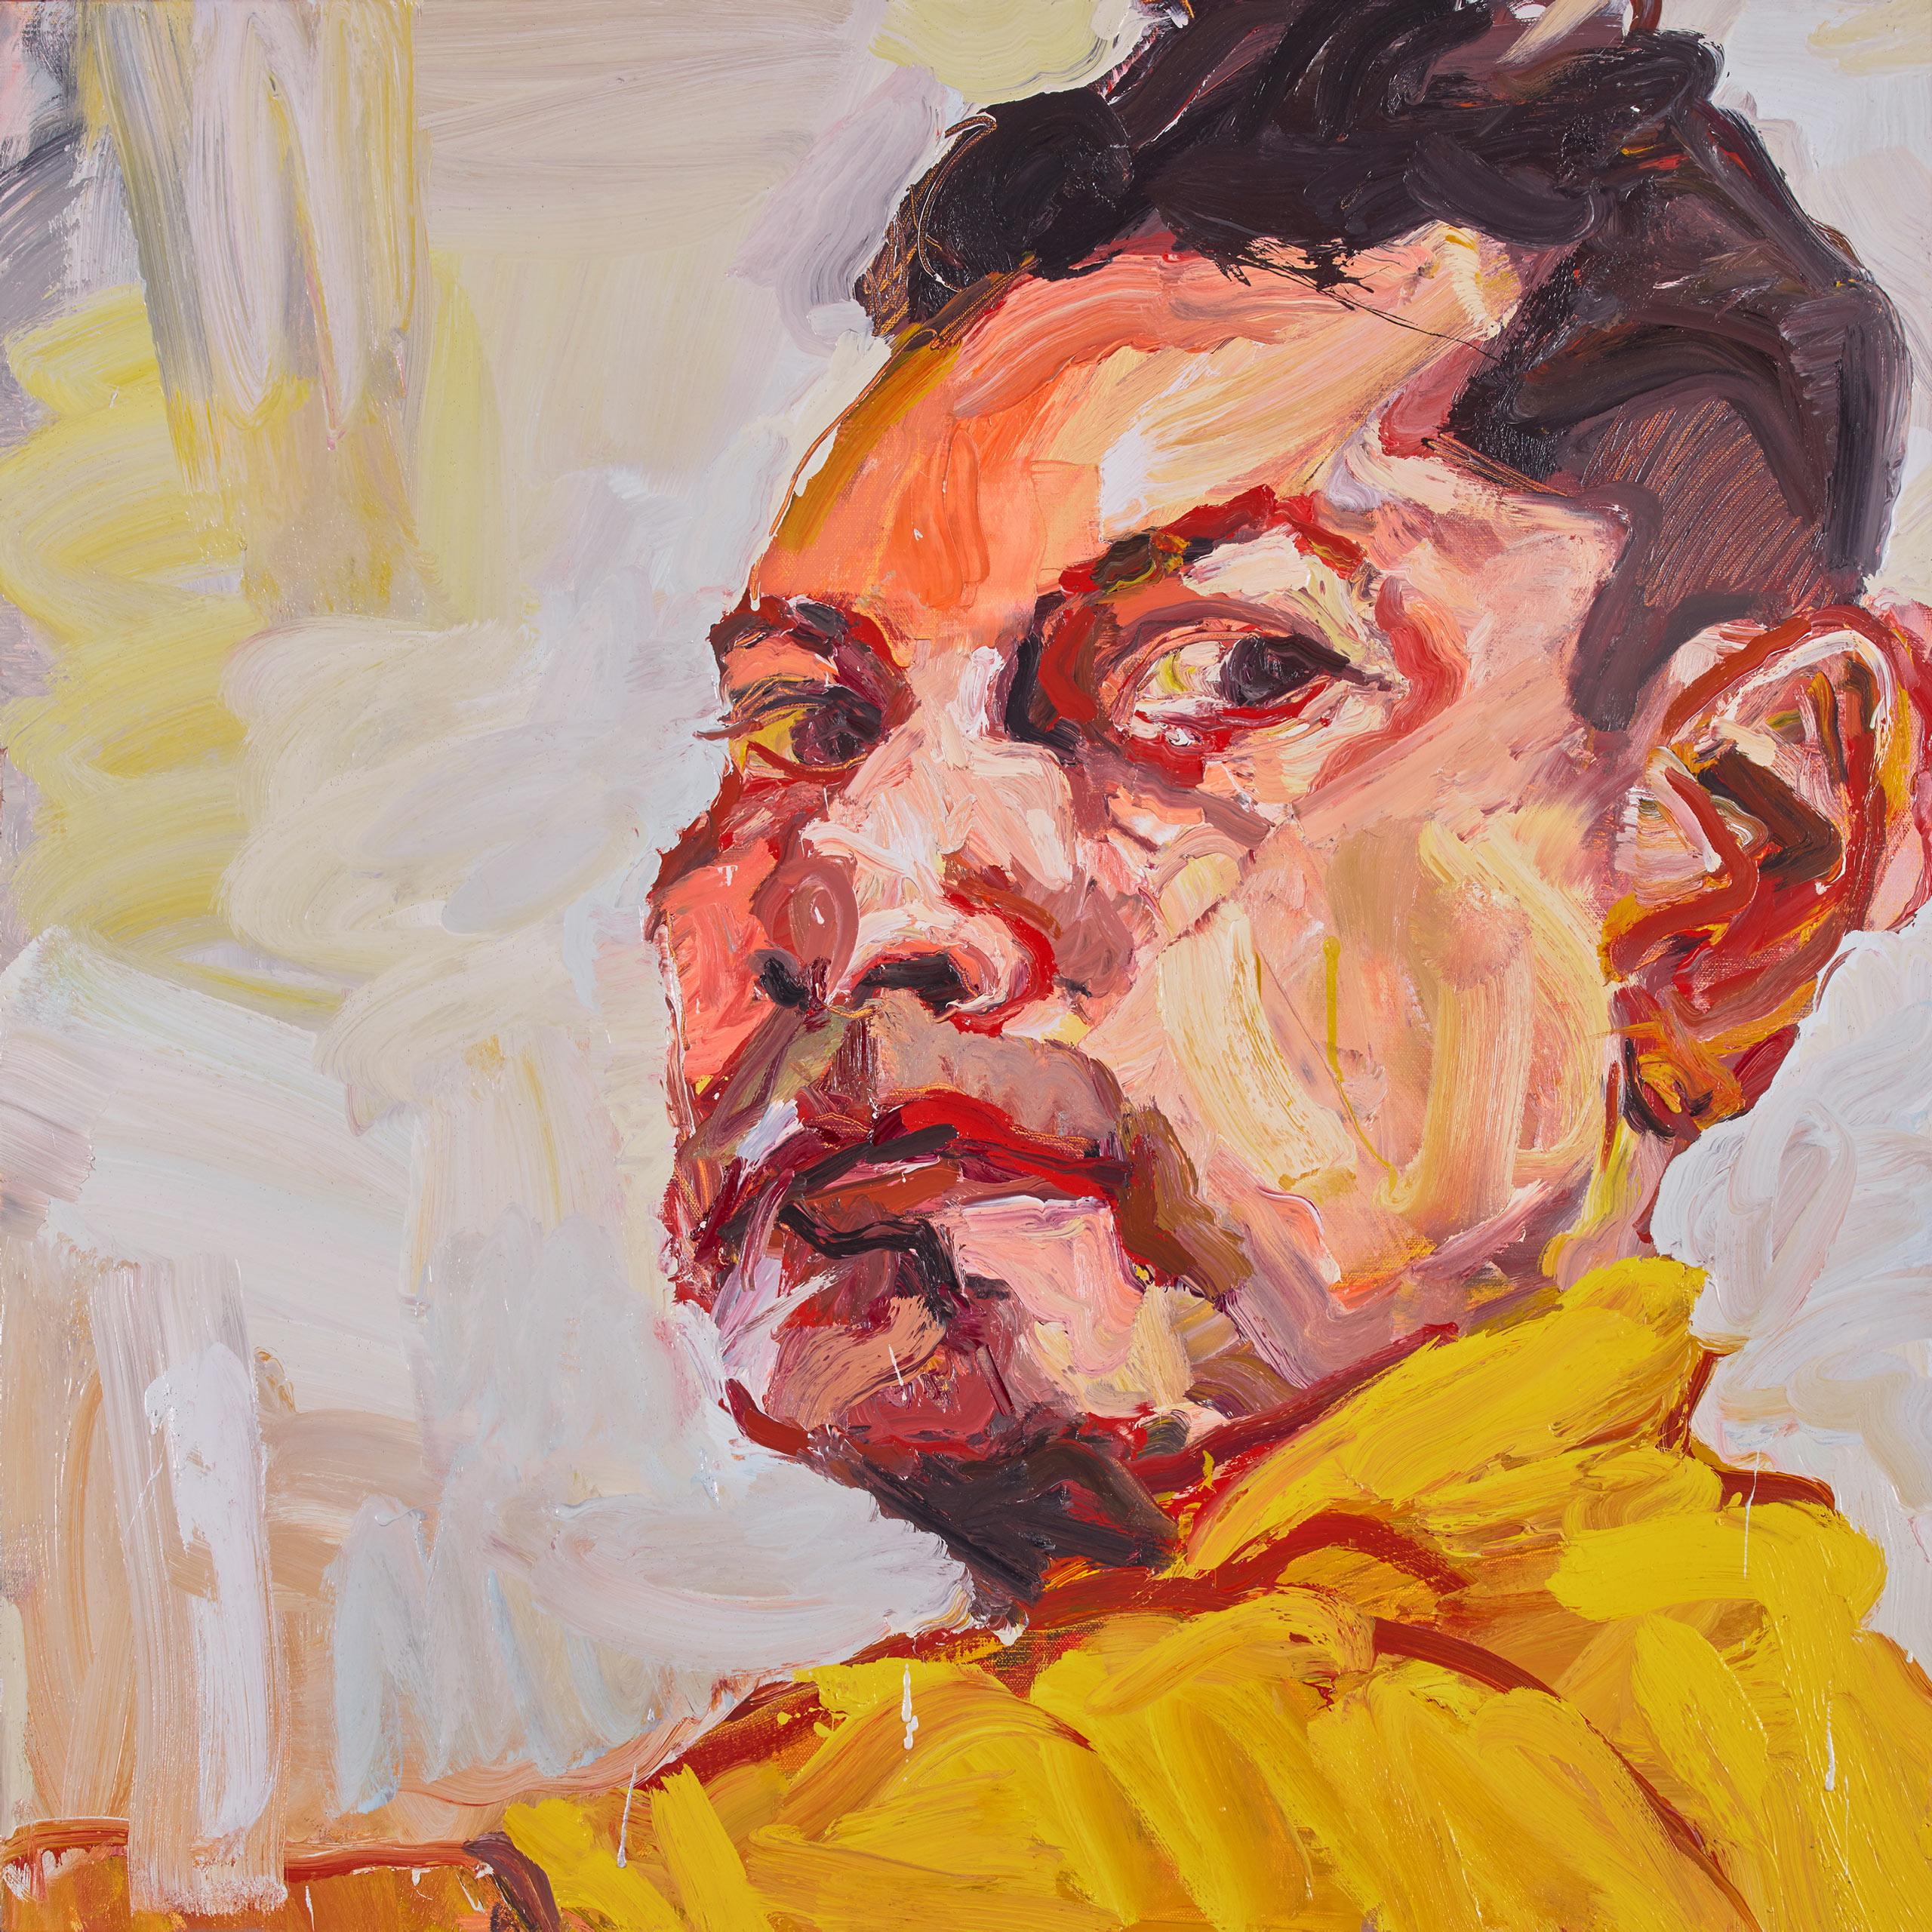 archibald prize Winner: archibald prize 2016 belynda henry louise olsen, a beautiful summary mark horton troy alan jones pat guy maestri shattered (griggs) dean manning maximum.